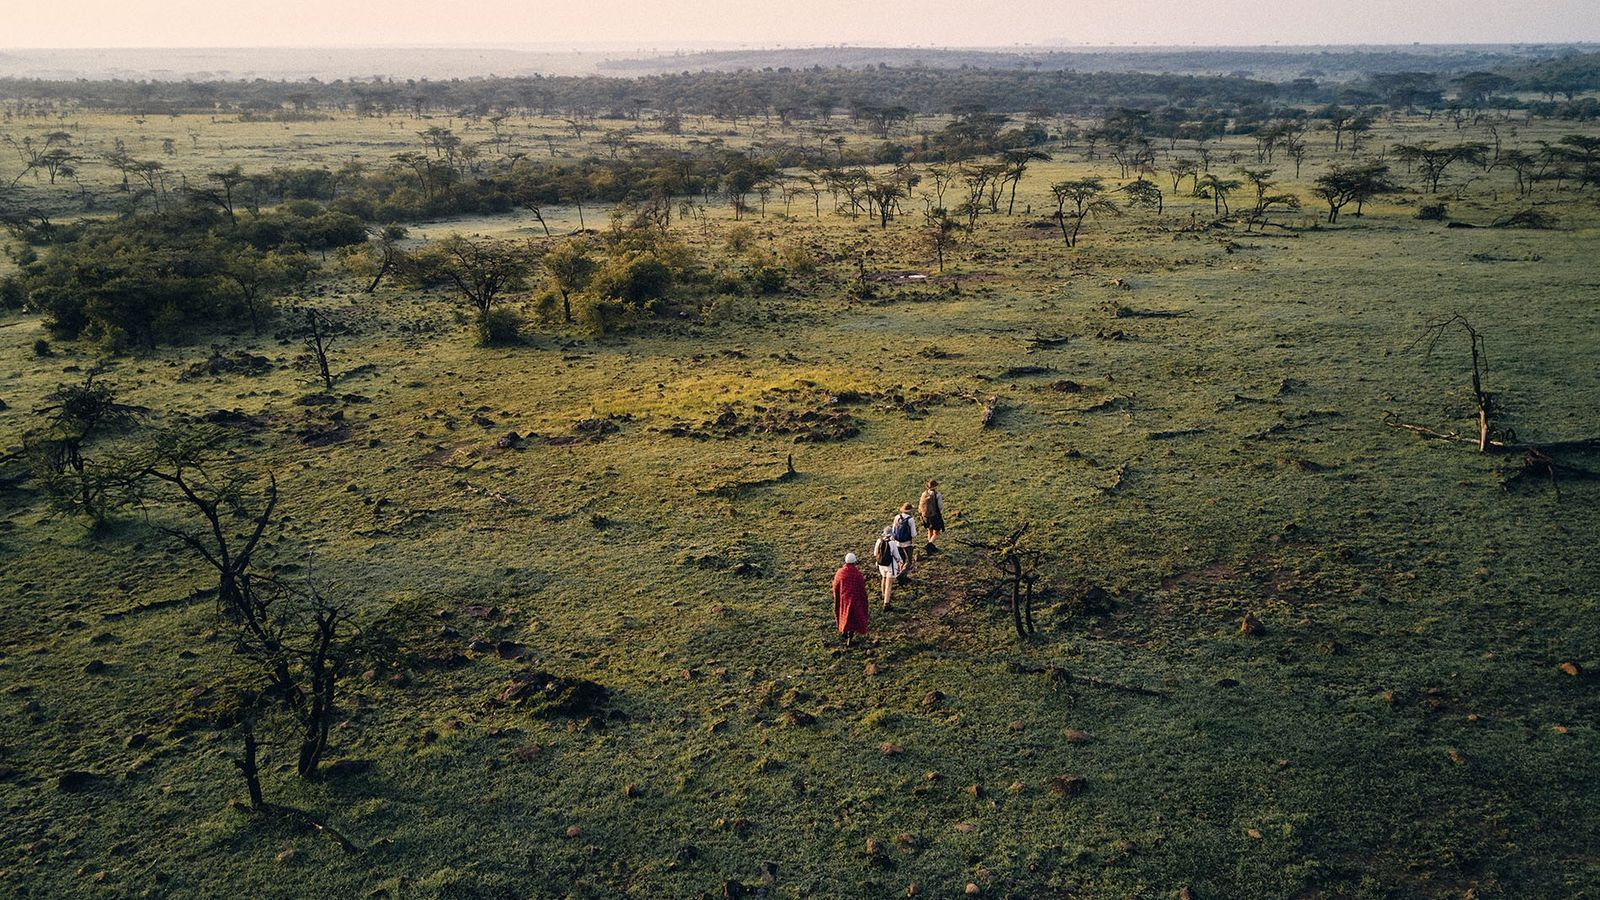 A walking safari in Naboisho Conservancy, north ofMaasai Mara National Reserve.